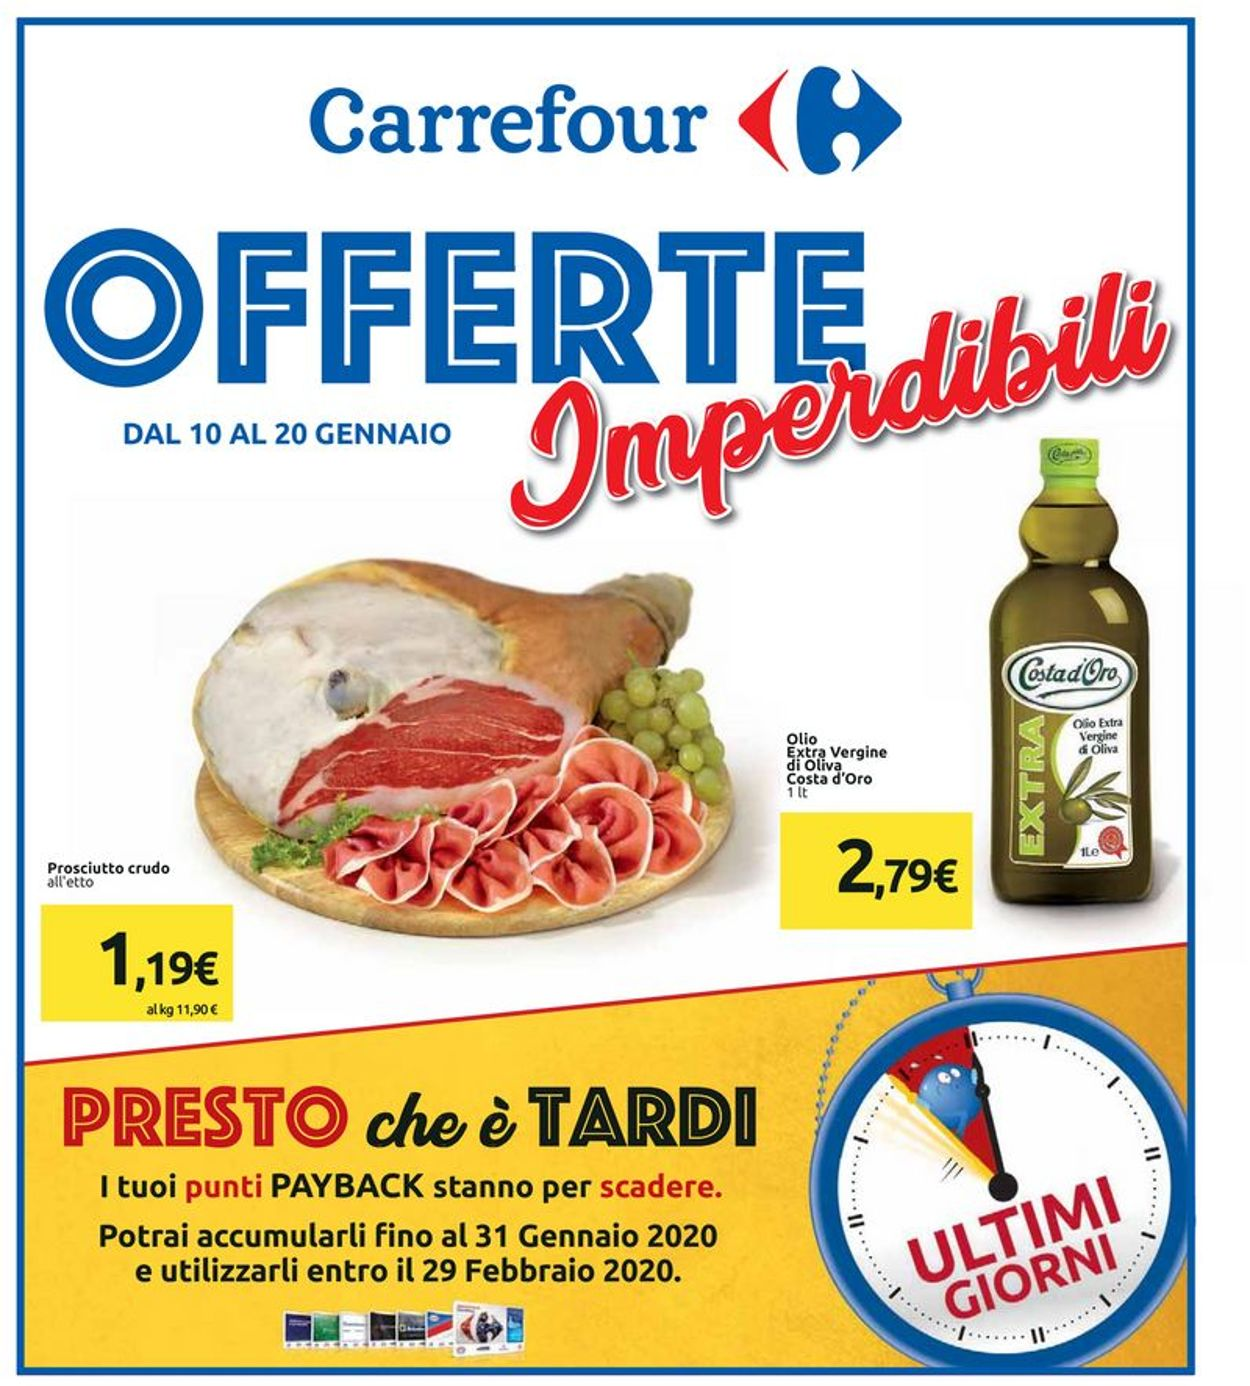 Volantino Carrefour - Offerte 10/01-20/01/2020